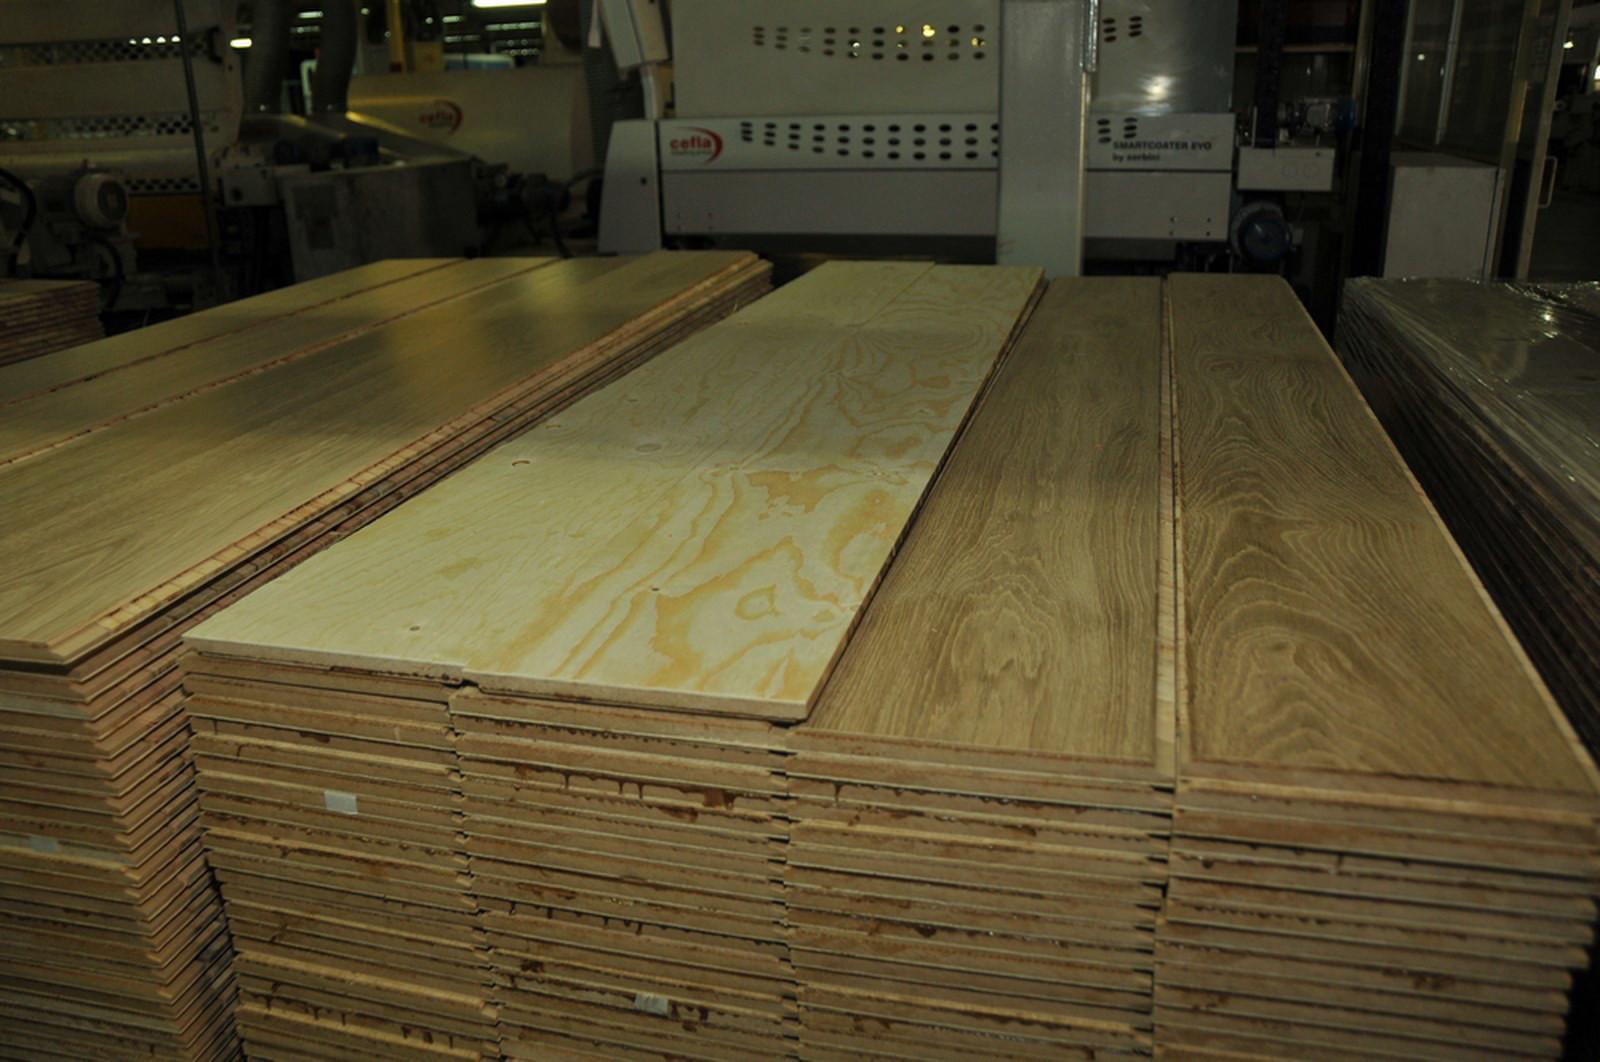 Hardwood Flooring Manufacturing Equipment Of Malaysian Timber Council Inside 1